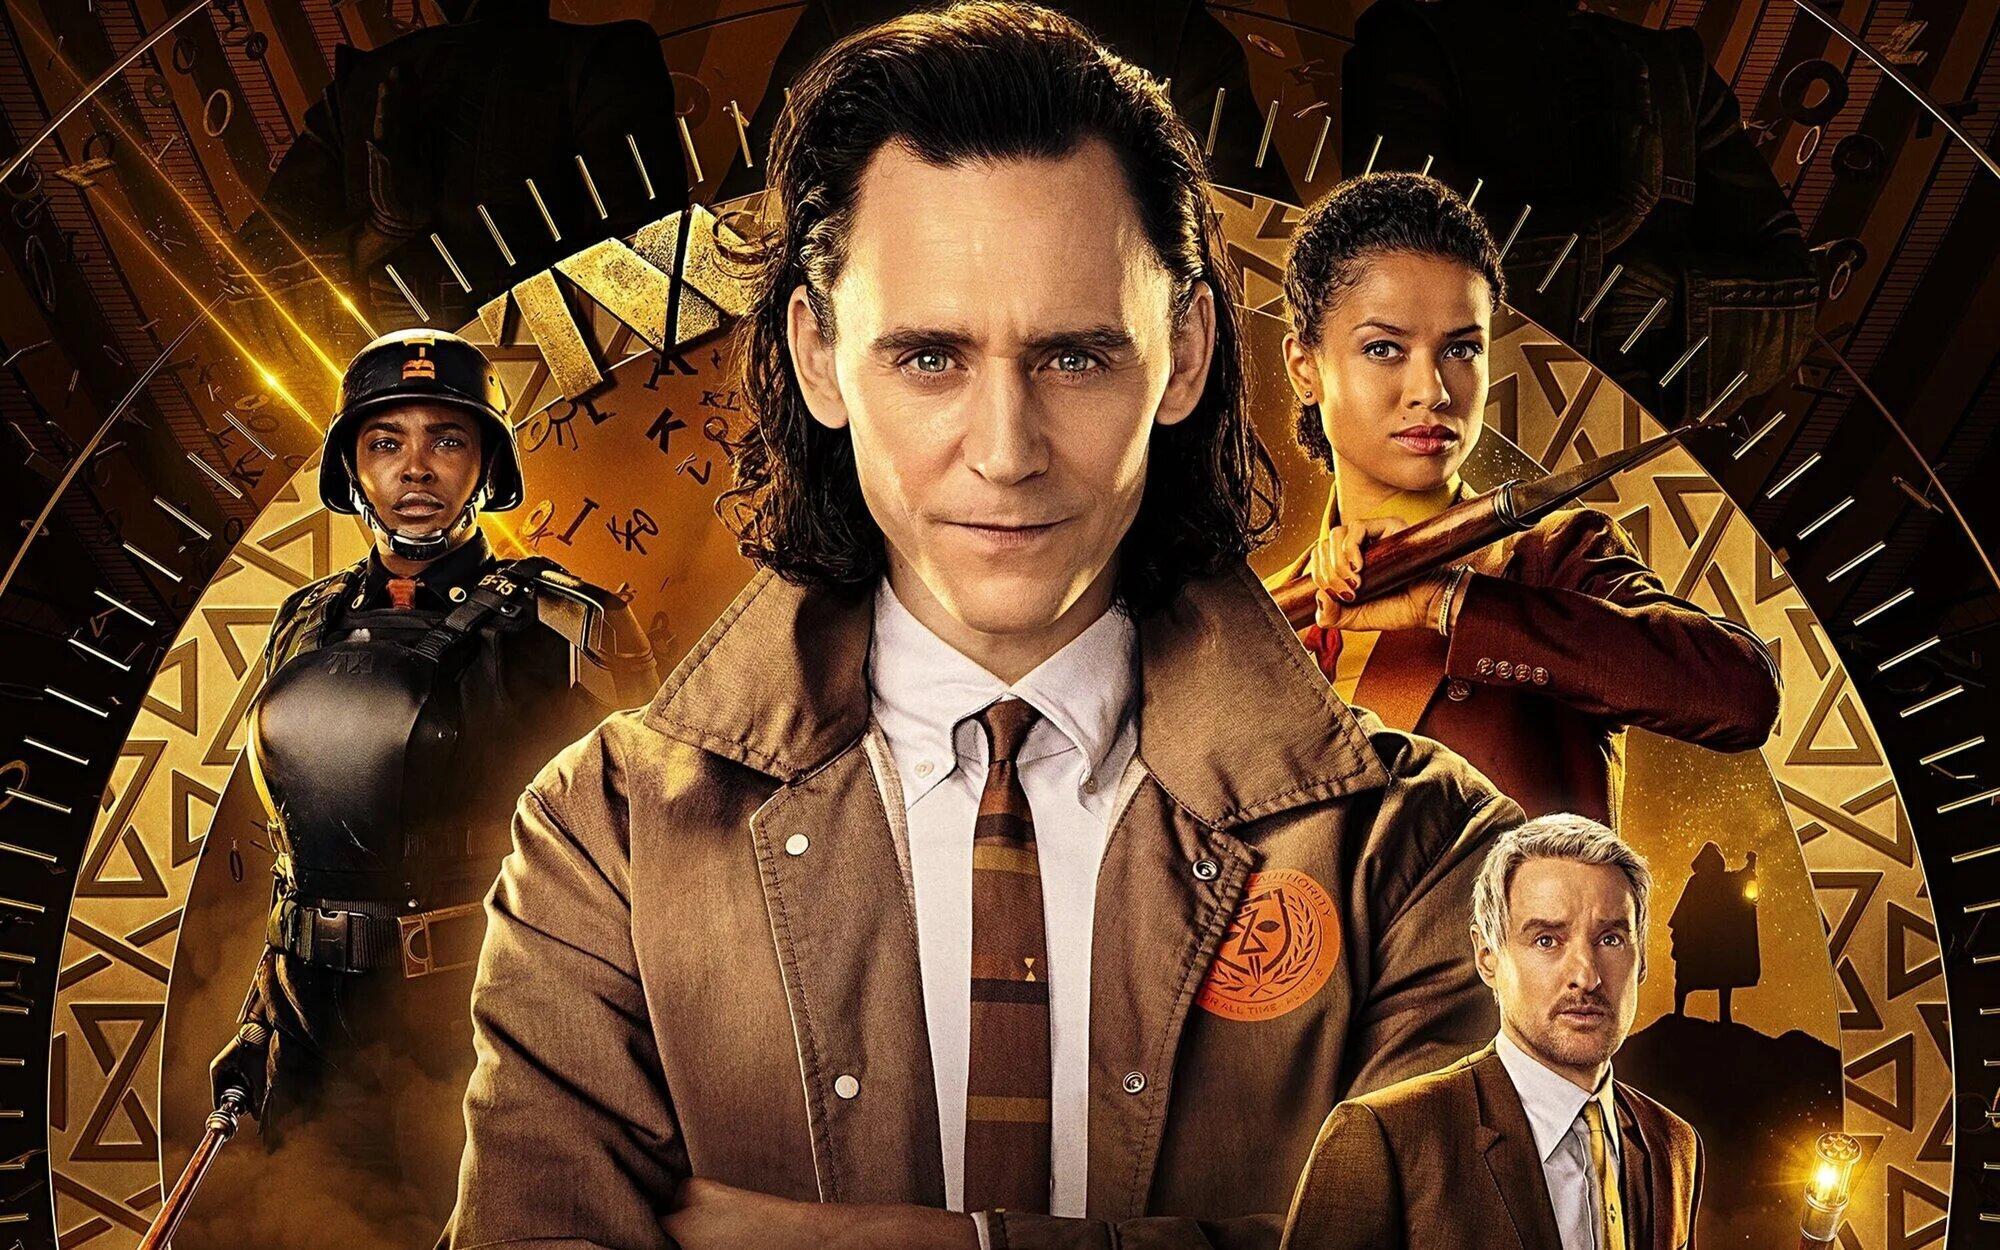 ¡Mañana se estrena Loki en Disney Plus! Prepárate para verlo desde tu país